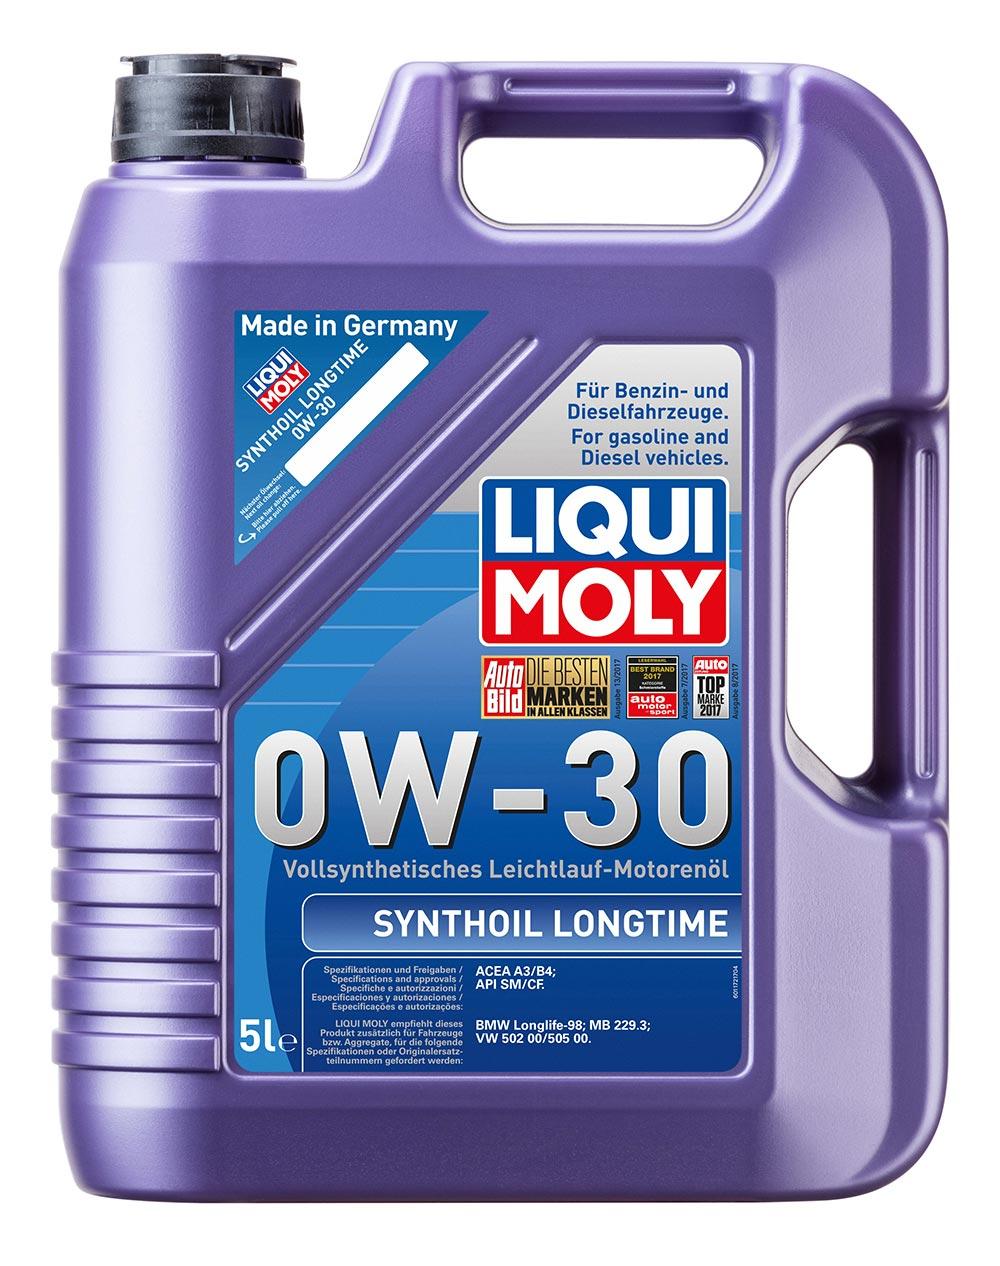 Масло моторное синт.0W30 Synthoil Longtime 5л API SM/CF.ACEA A3/B4.MB229.3.VW 50